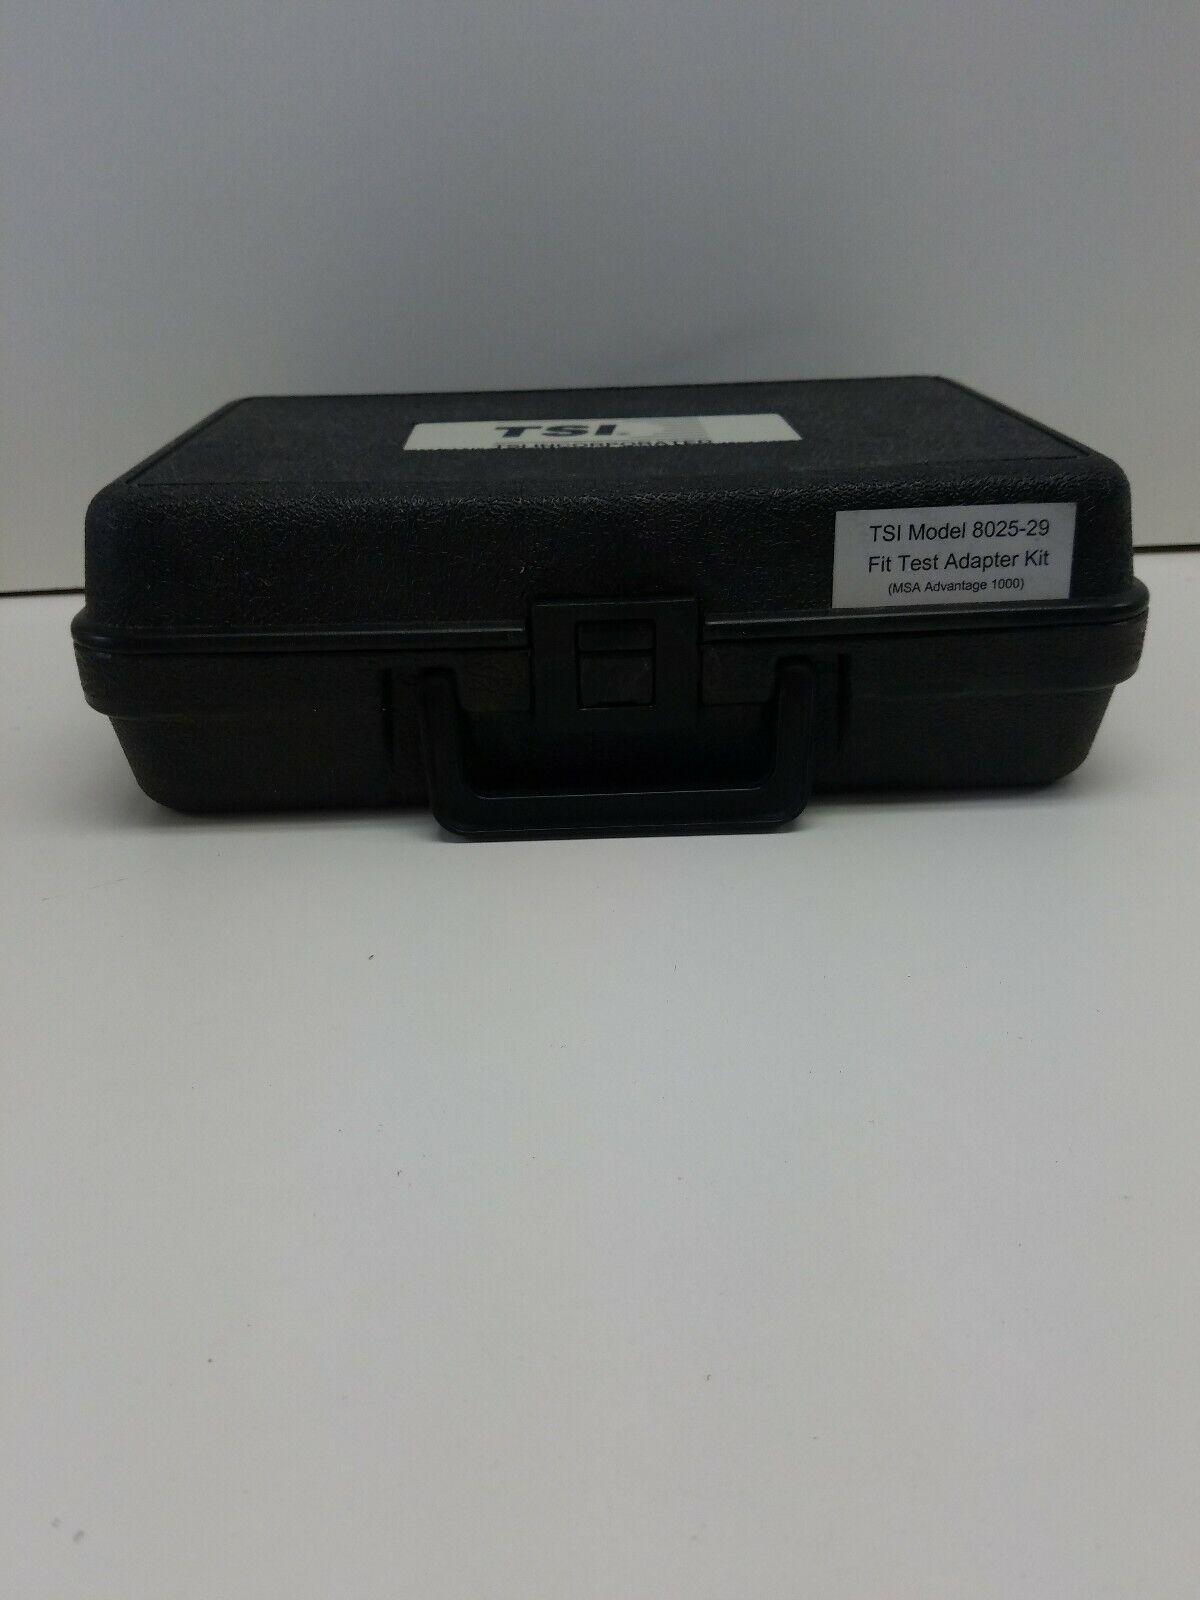 TSI 8025-29 Adapter Kit for MSA Military Bayonet Style Advantage 1000